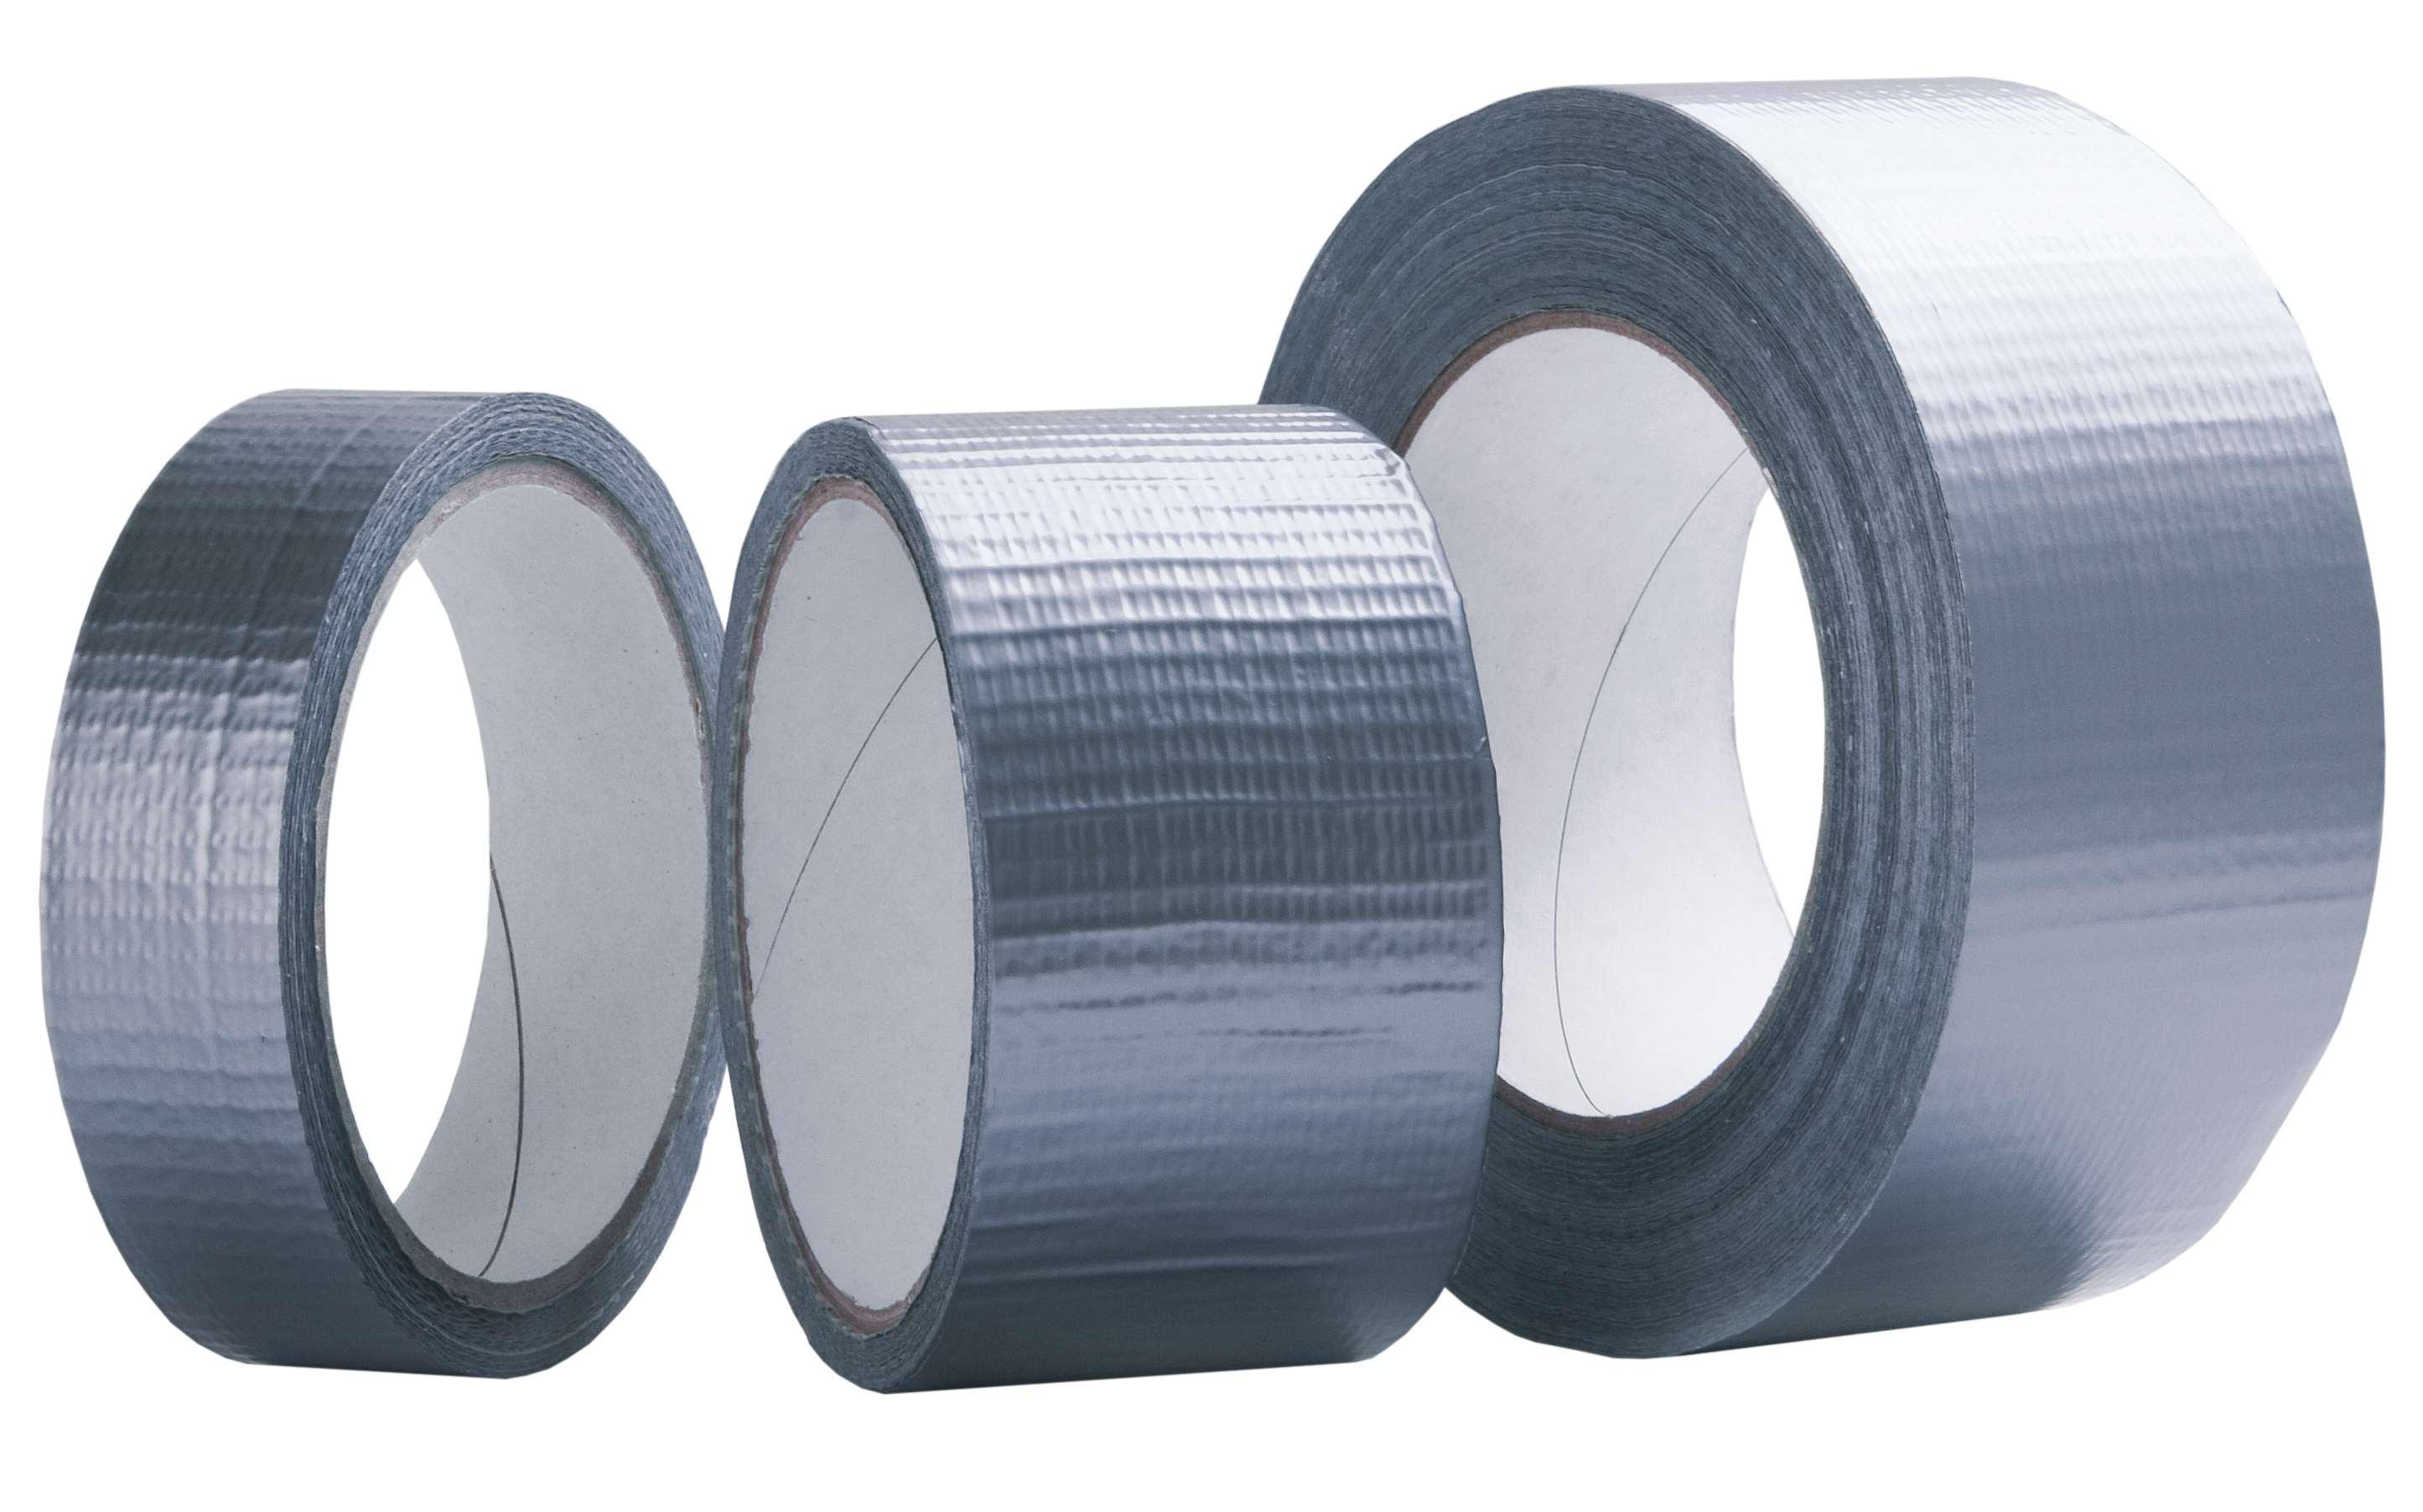 LOCKTAPE textilní stříbrná DUCT páska 48mmx50m